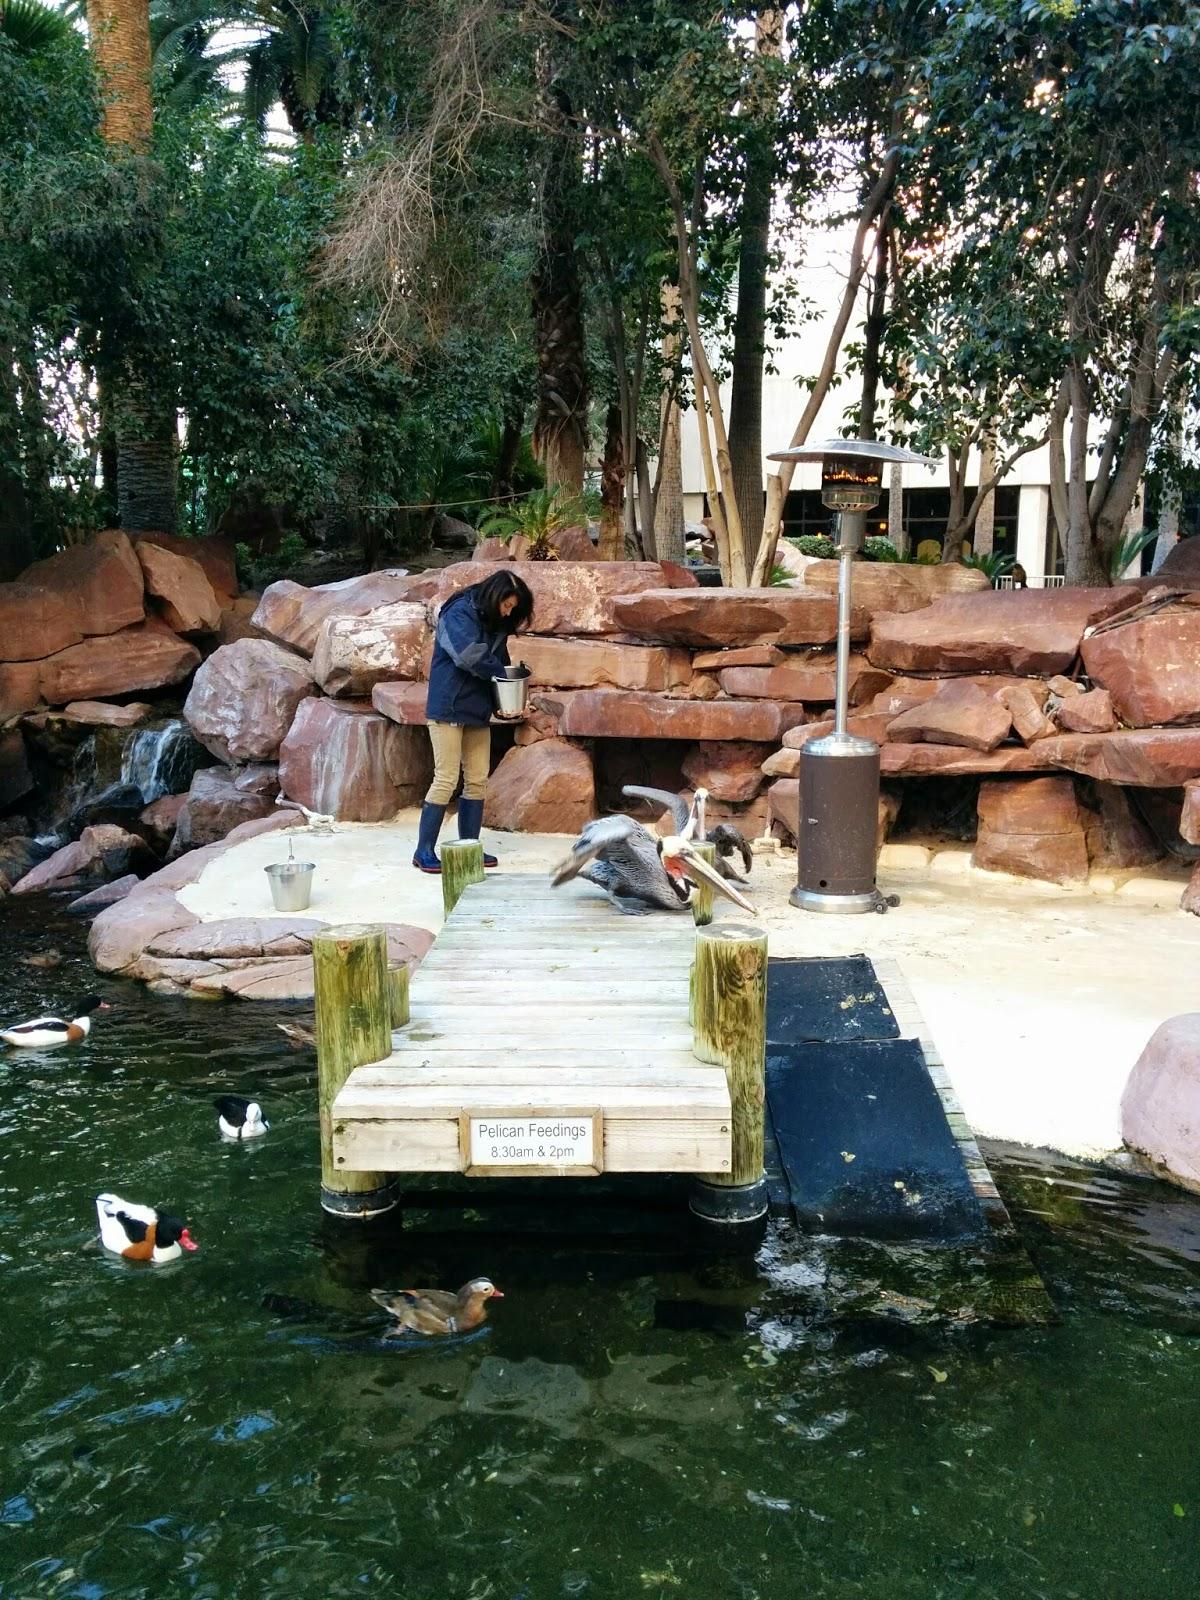 Pelican Feeding at the Wildlife Habitat at The Flamingo | Las Vegas